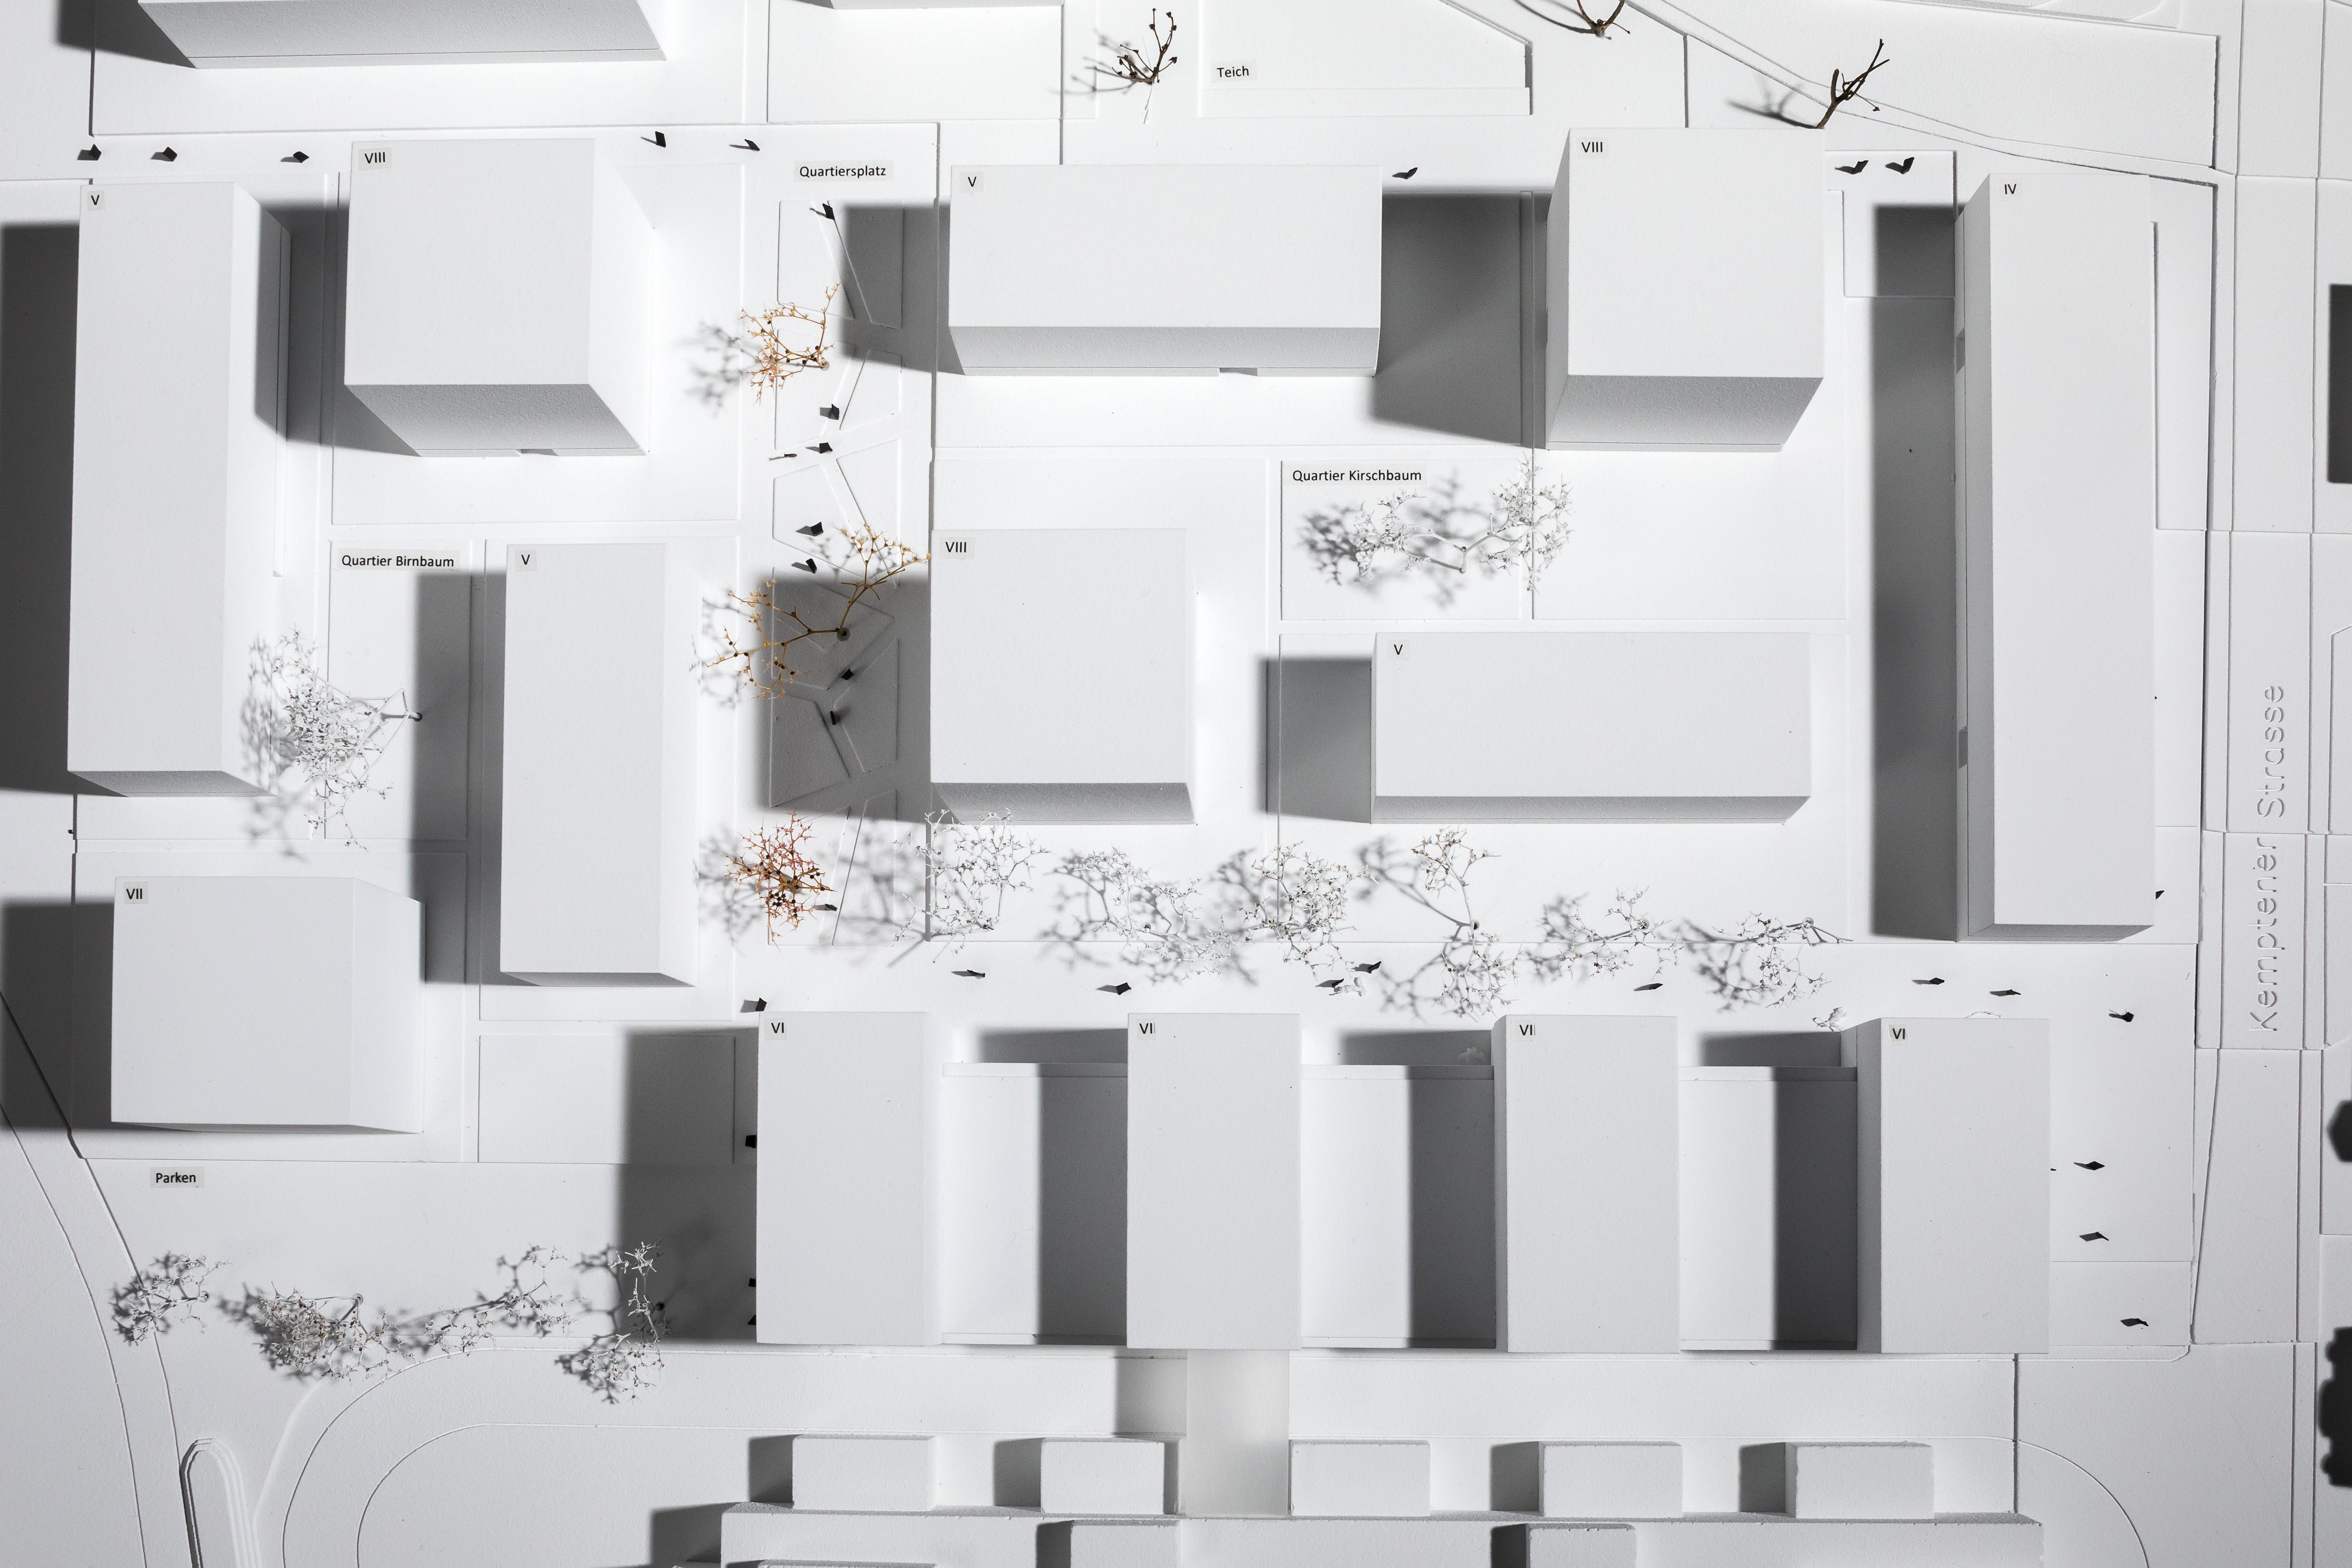 lindau reutin cofely areal wird vier linden quartier. Black Bedroom Furniture Sets. Home Design Ideas